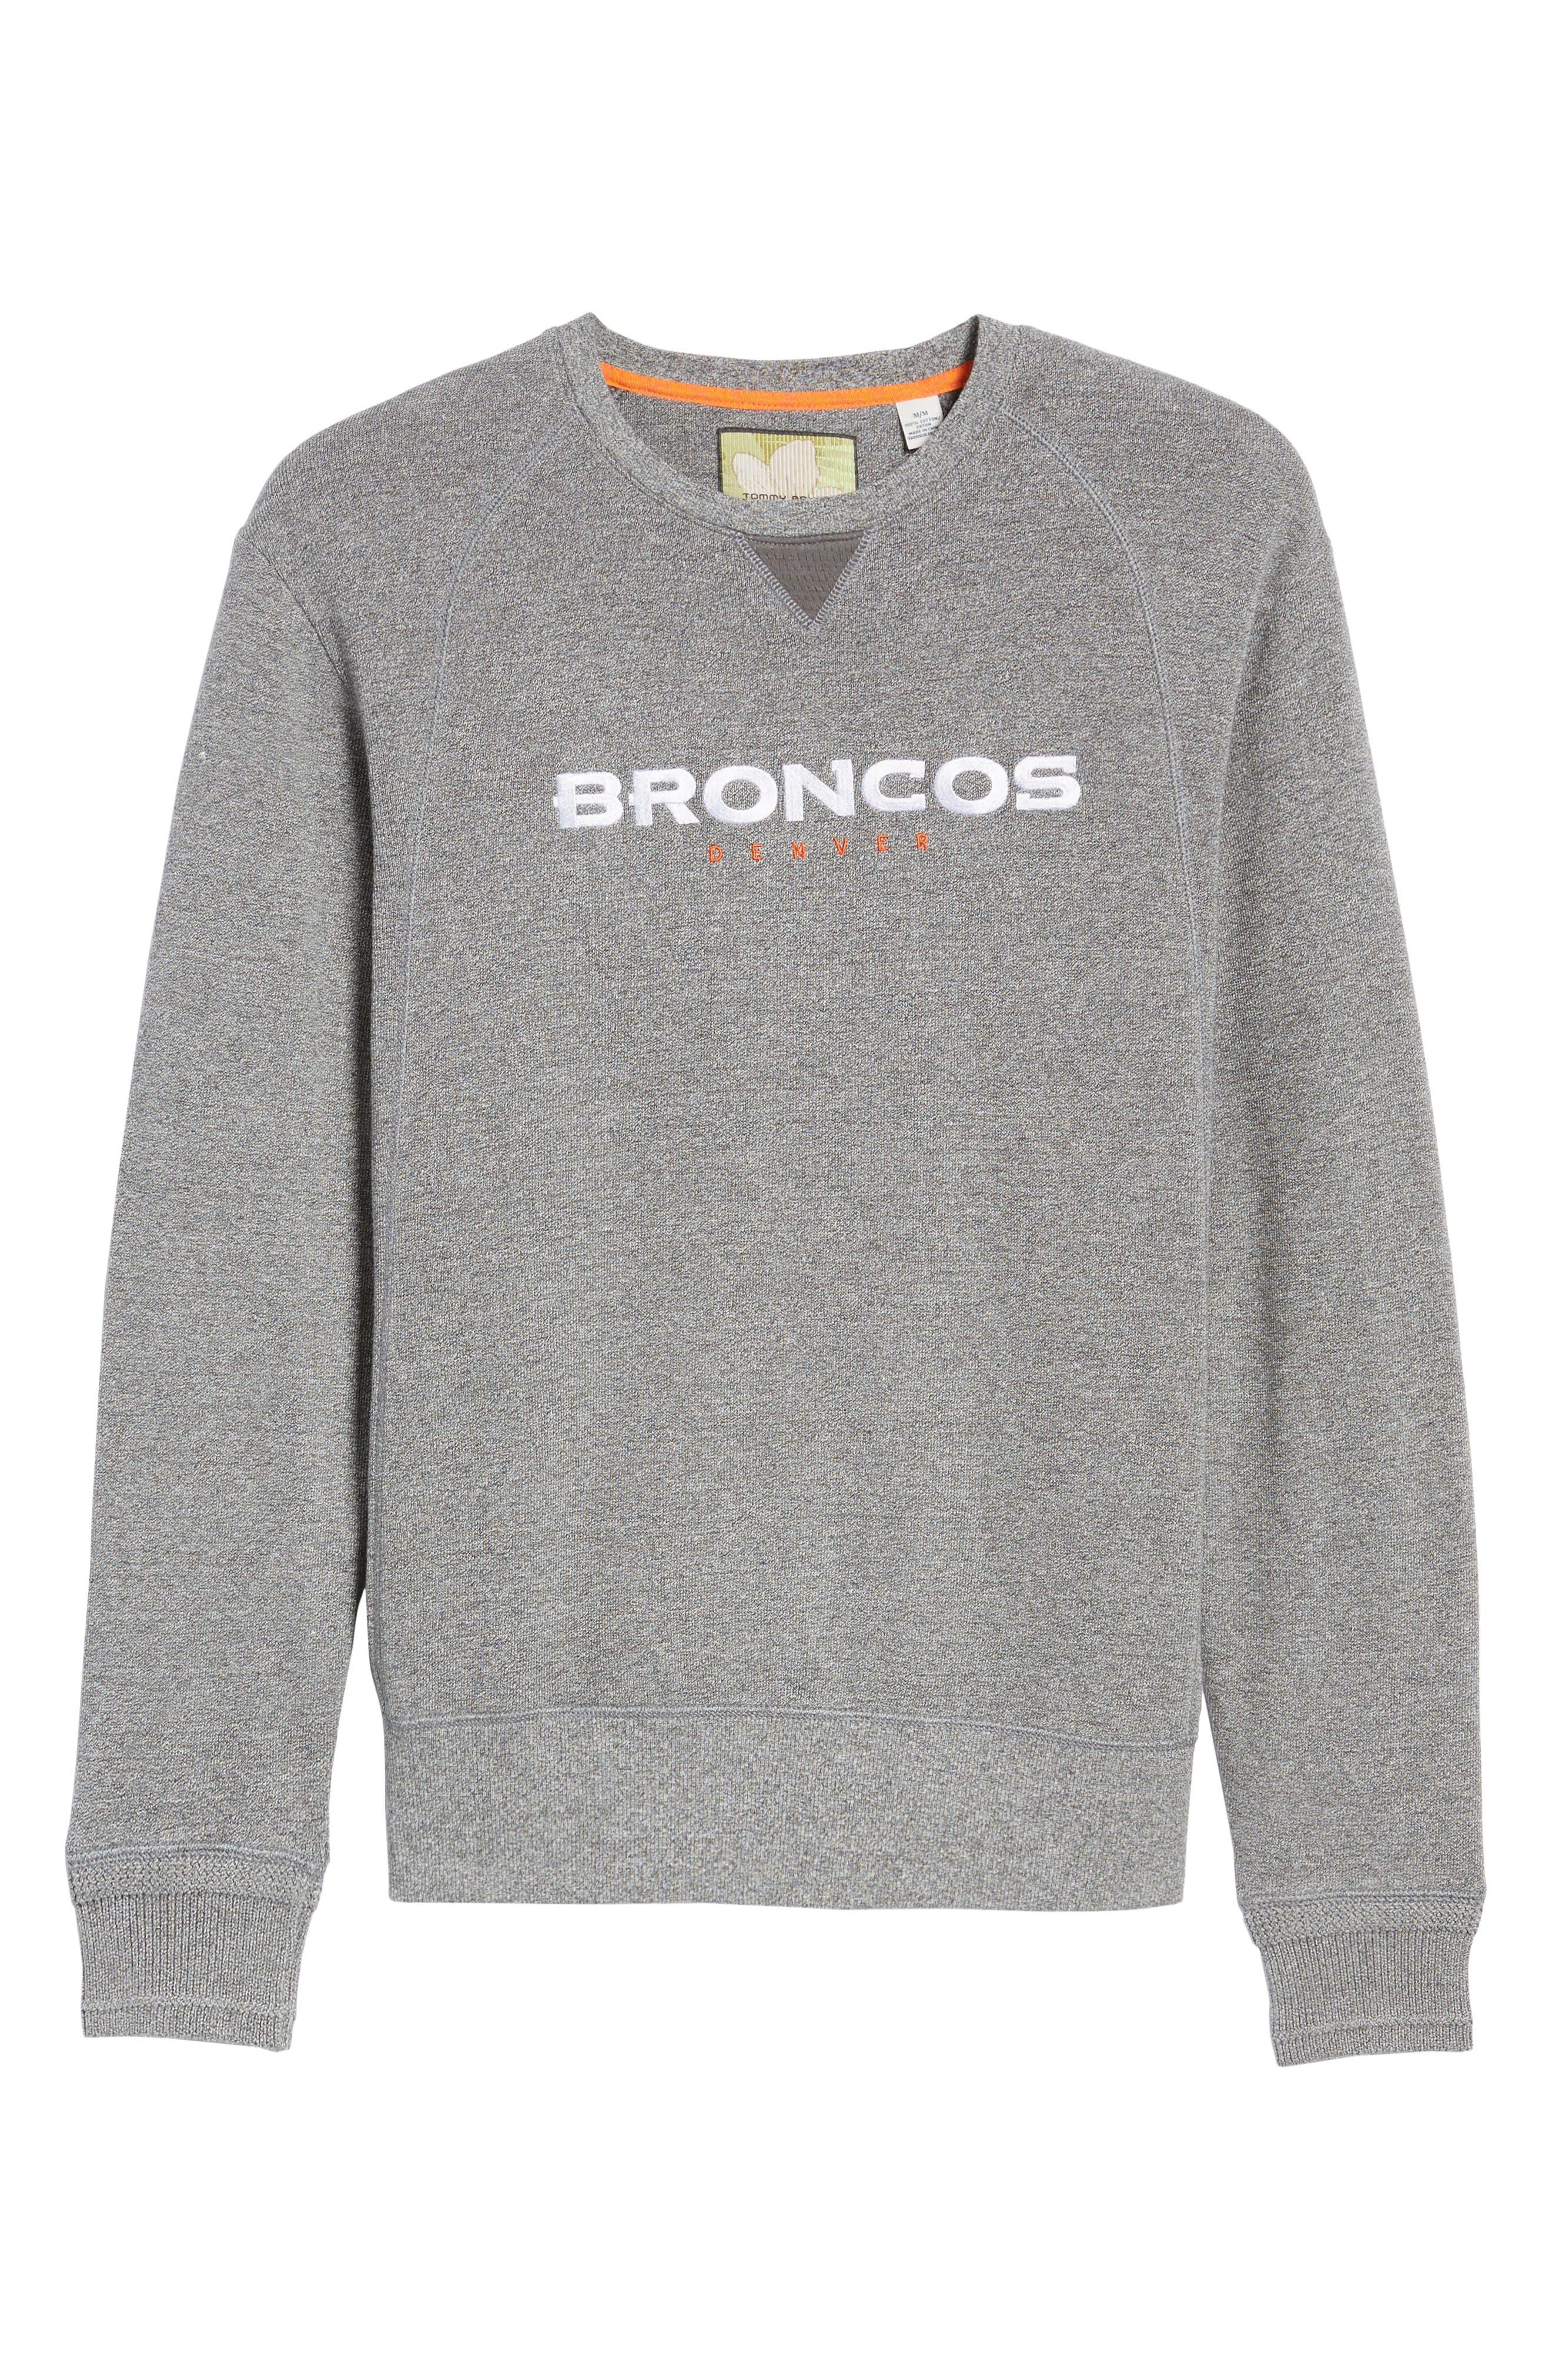 NFL Stitch of Liberty Embroidered Crewneck Sweatshirt,                             Alternate thumbnail 158, color,